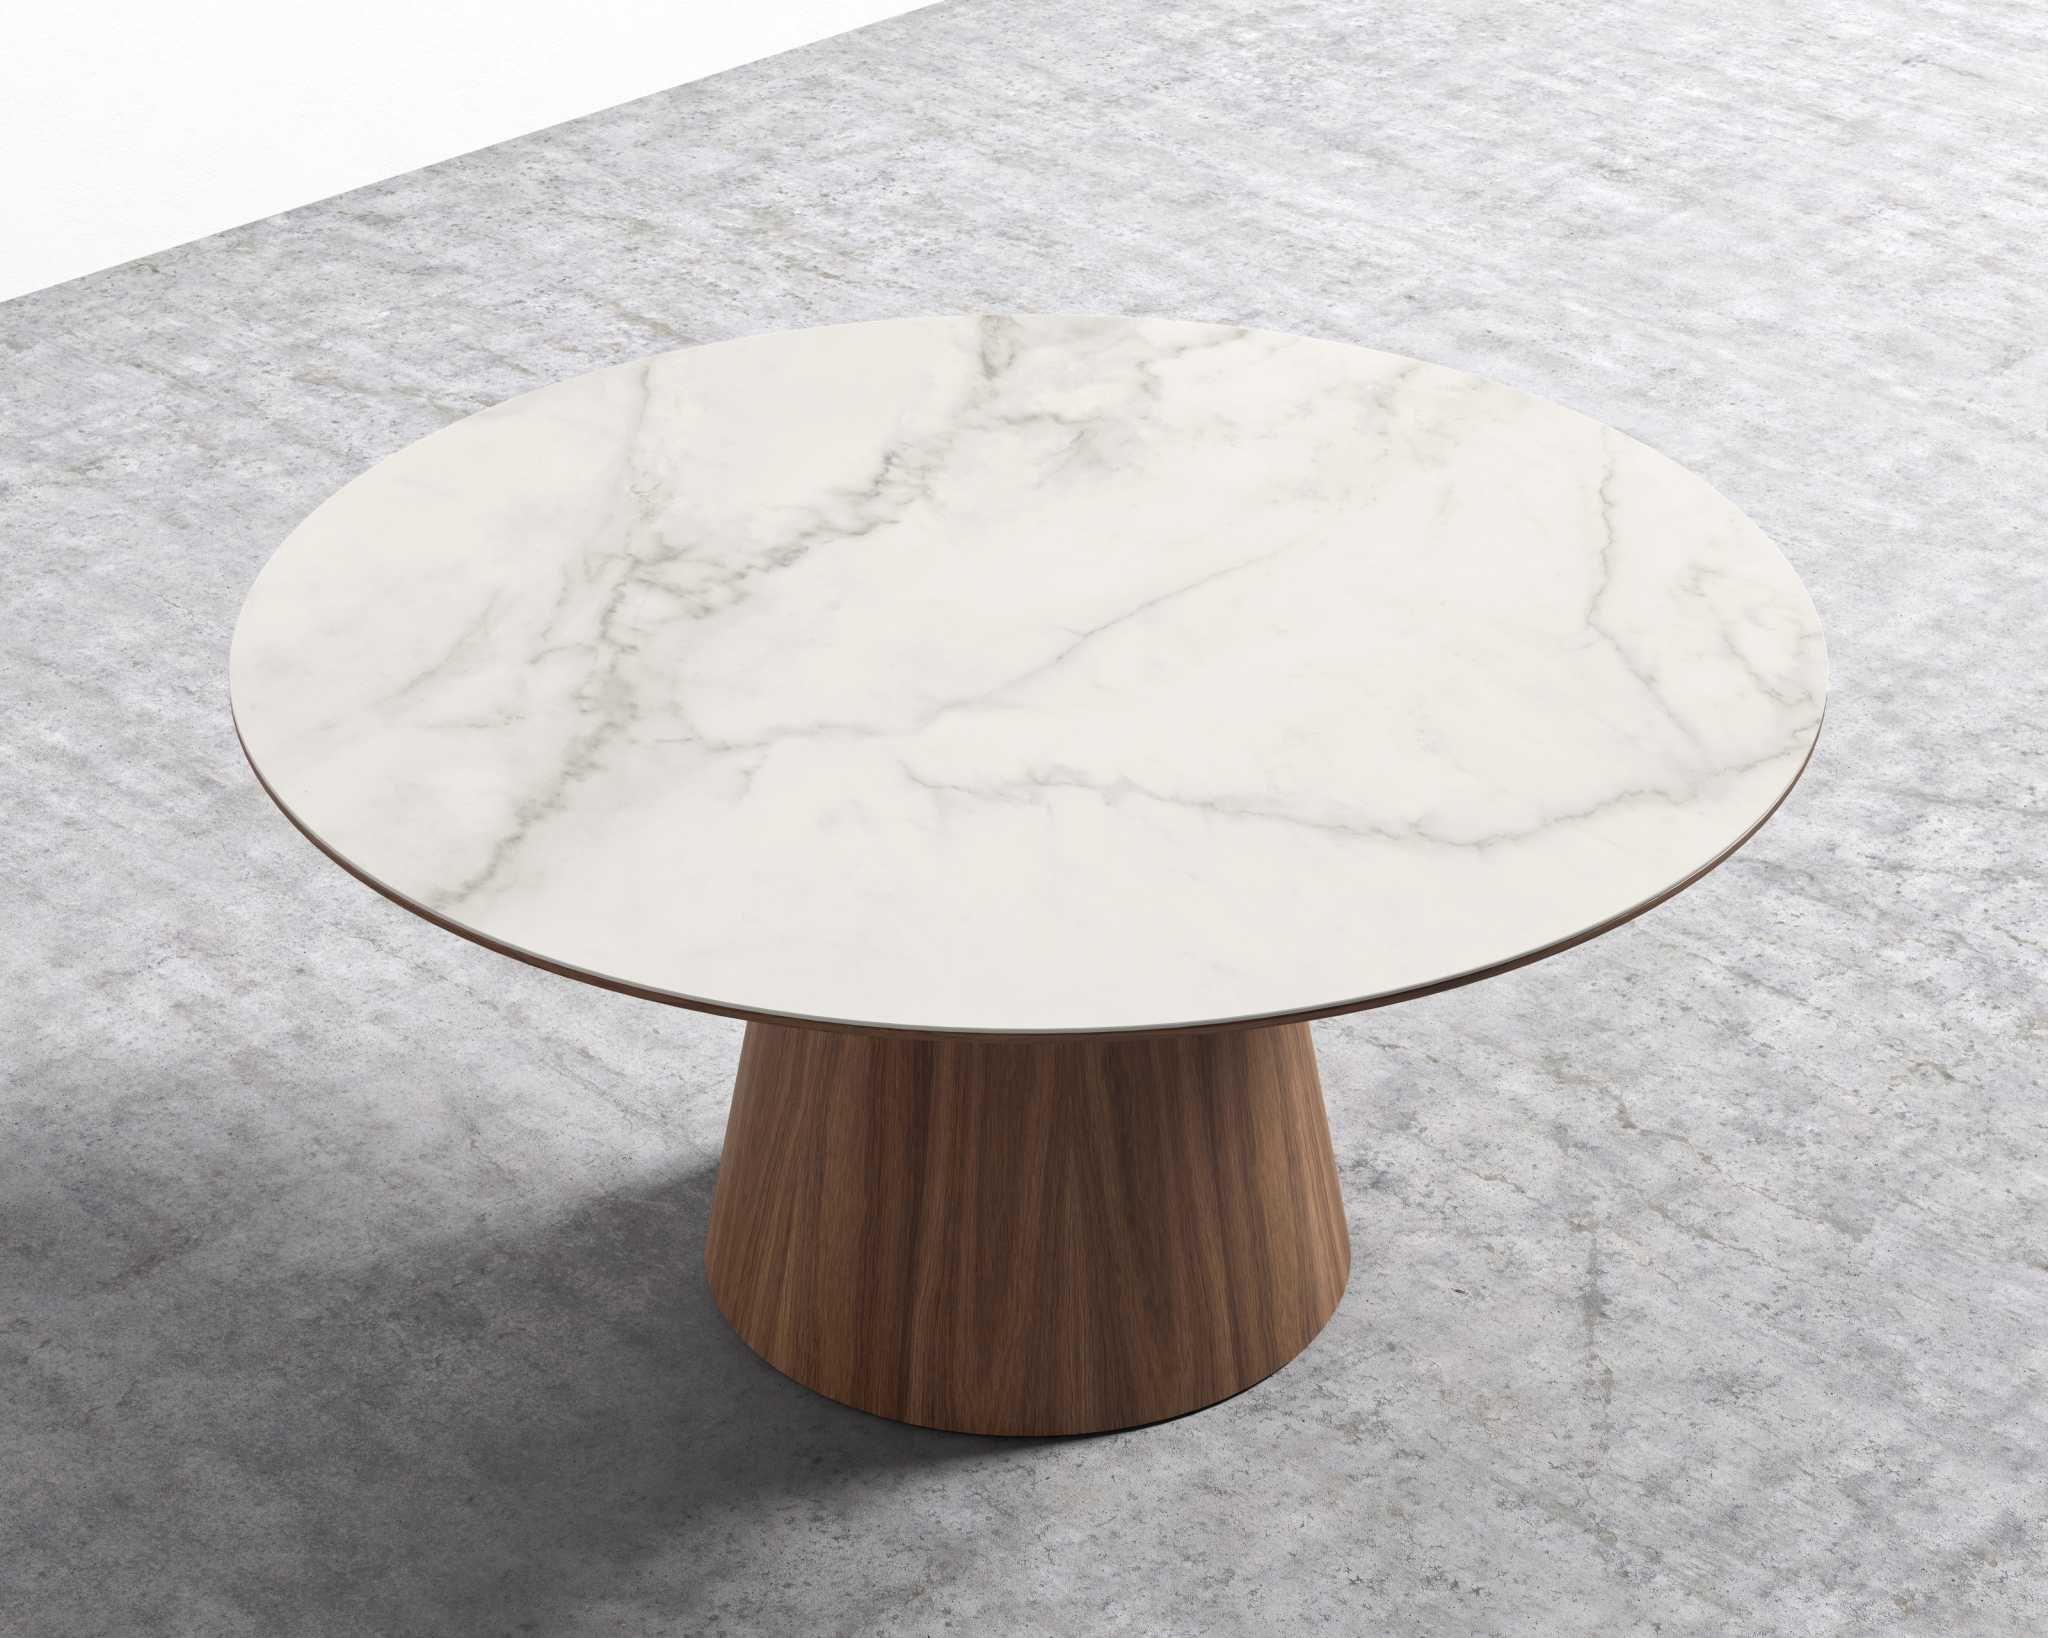 Winston Dining Table 47 European Ceramic Modern Marble Dining Tables Round Marble Dining Table Dining Table [ 1638 x 2048 Pixel ]